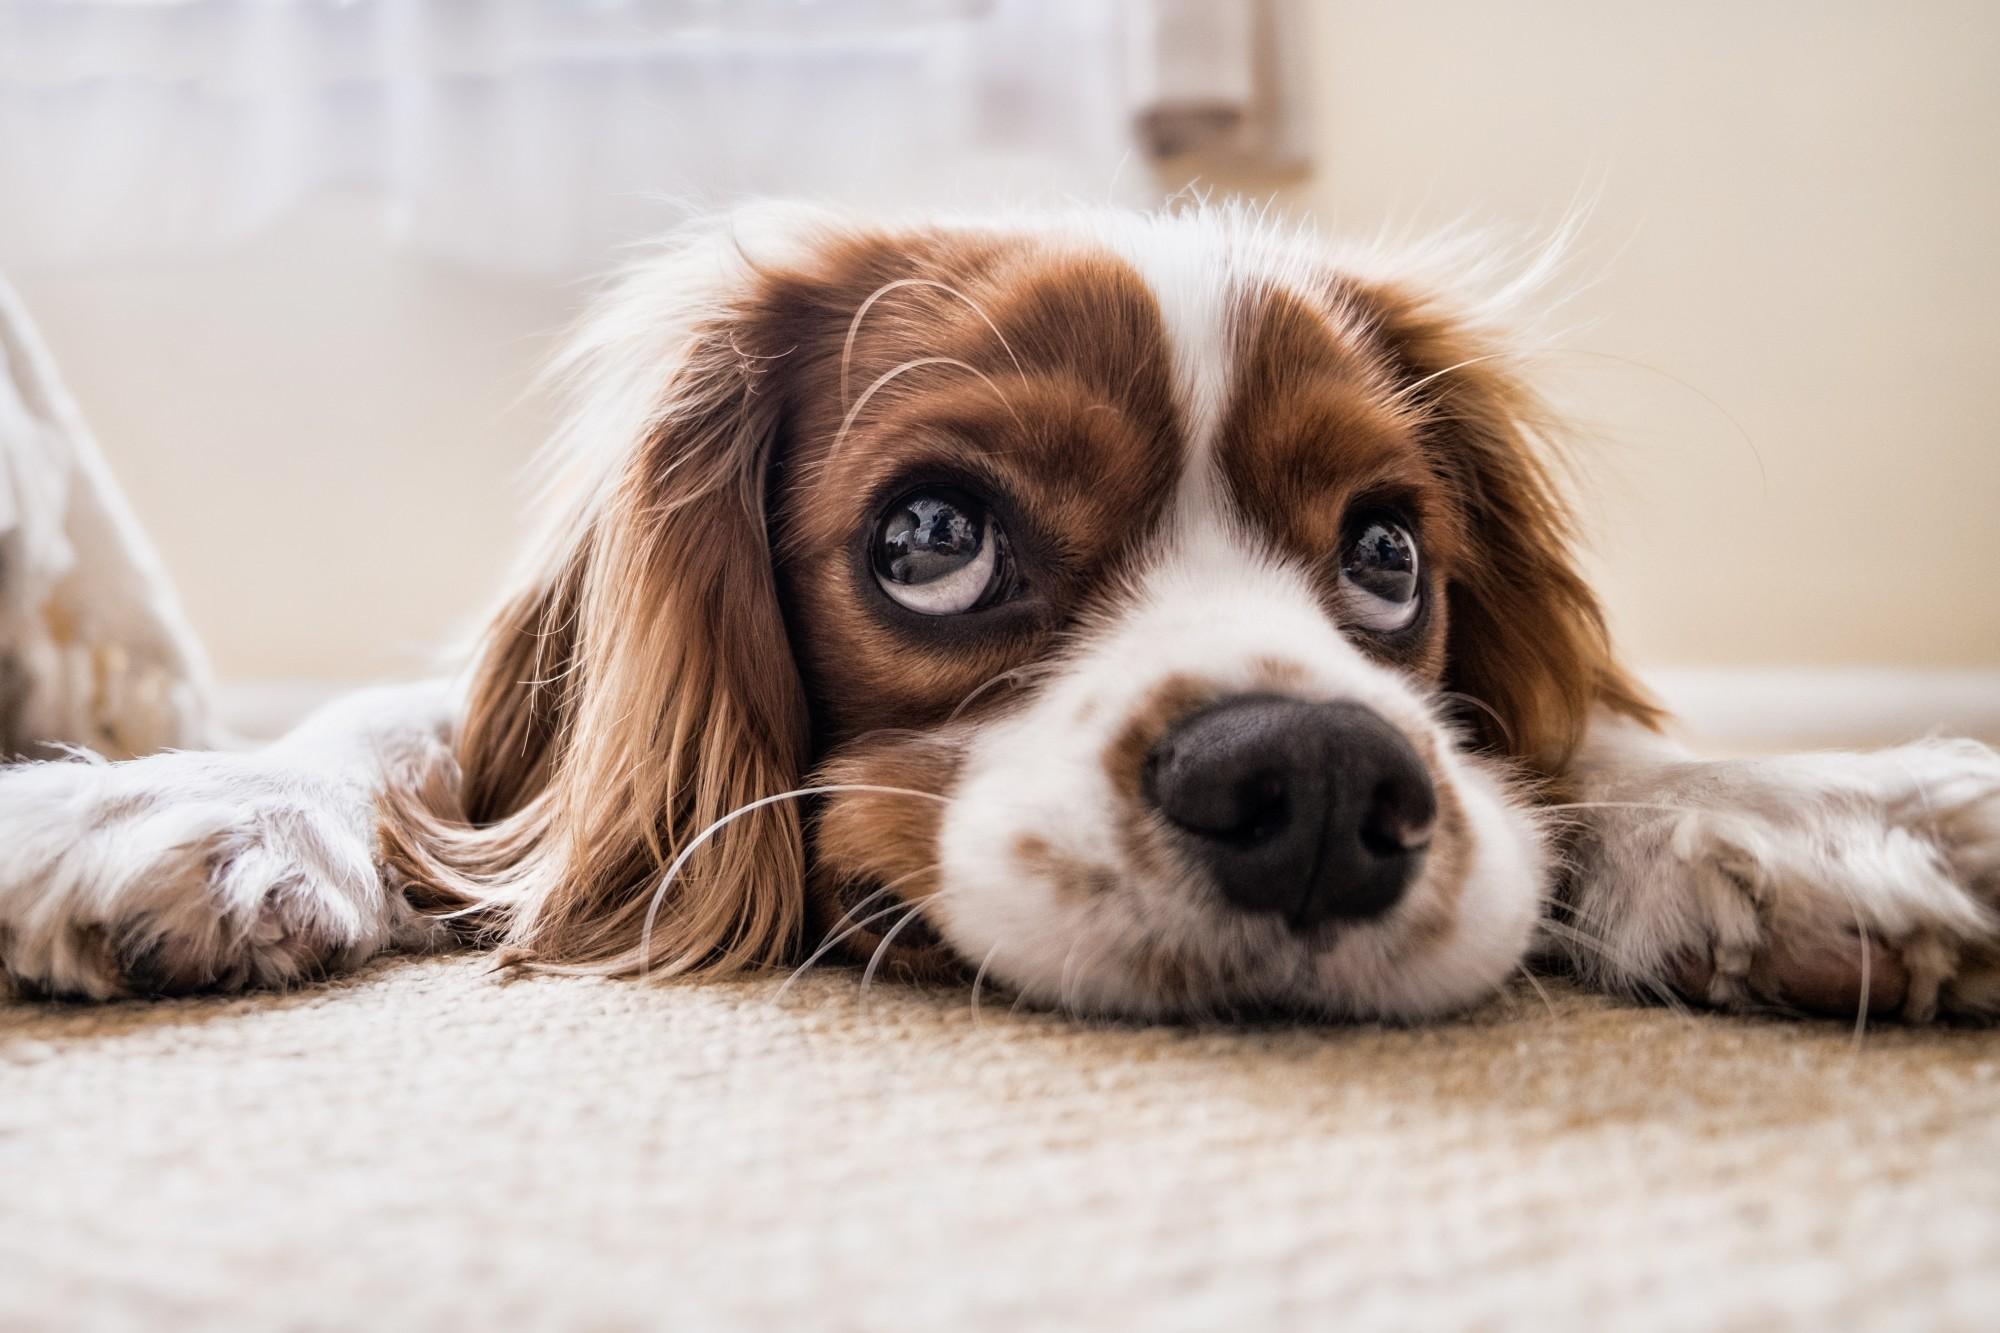 puppy on floor looking up